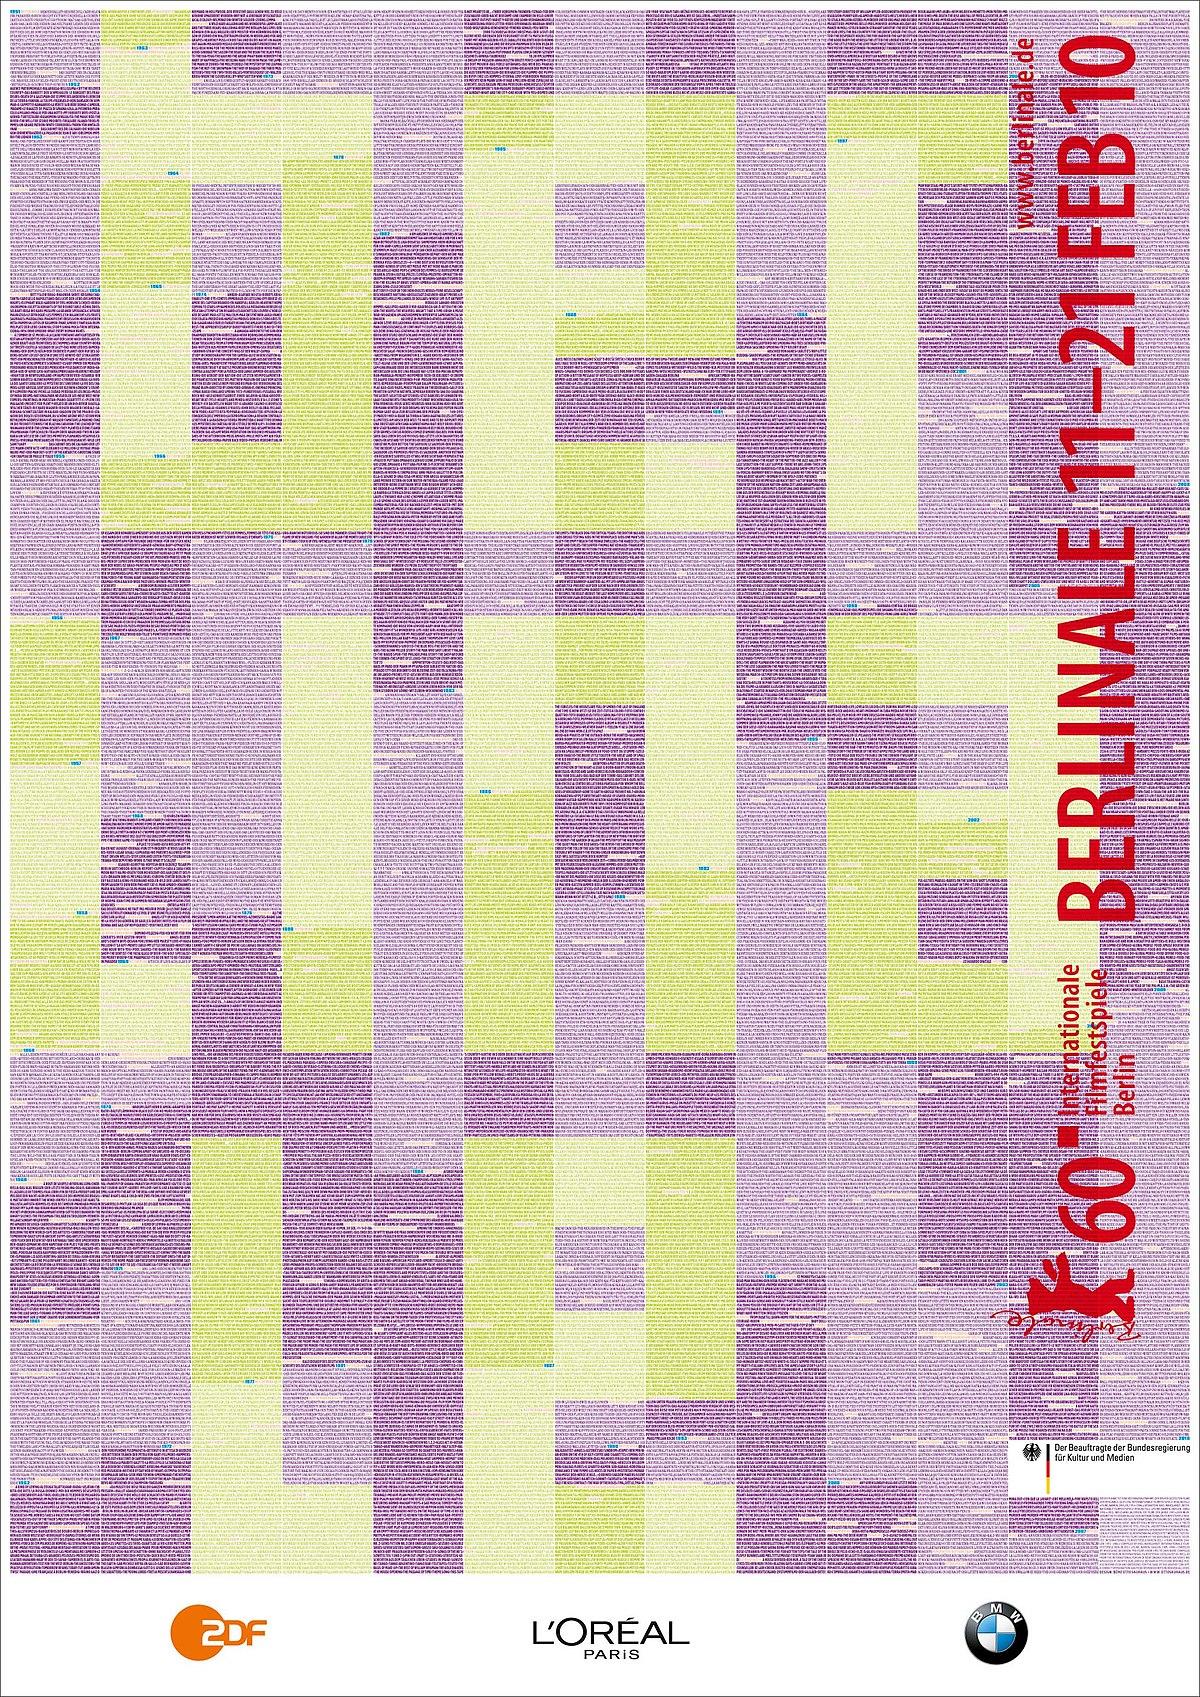 internationale filmfestspiele berlin 2010 wikipedia. Black Bedroom Furniture Sets. Home Design Ideas